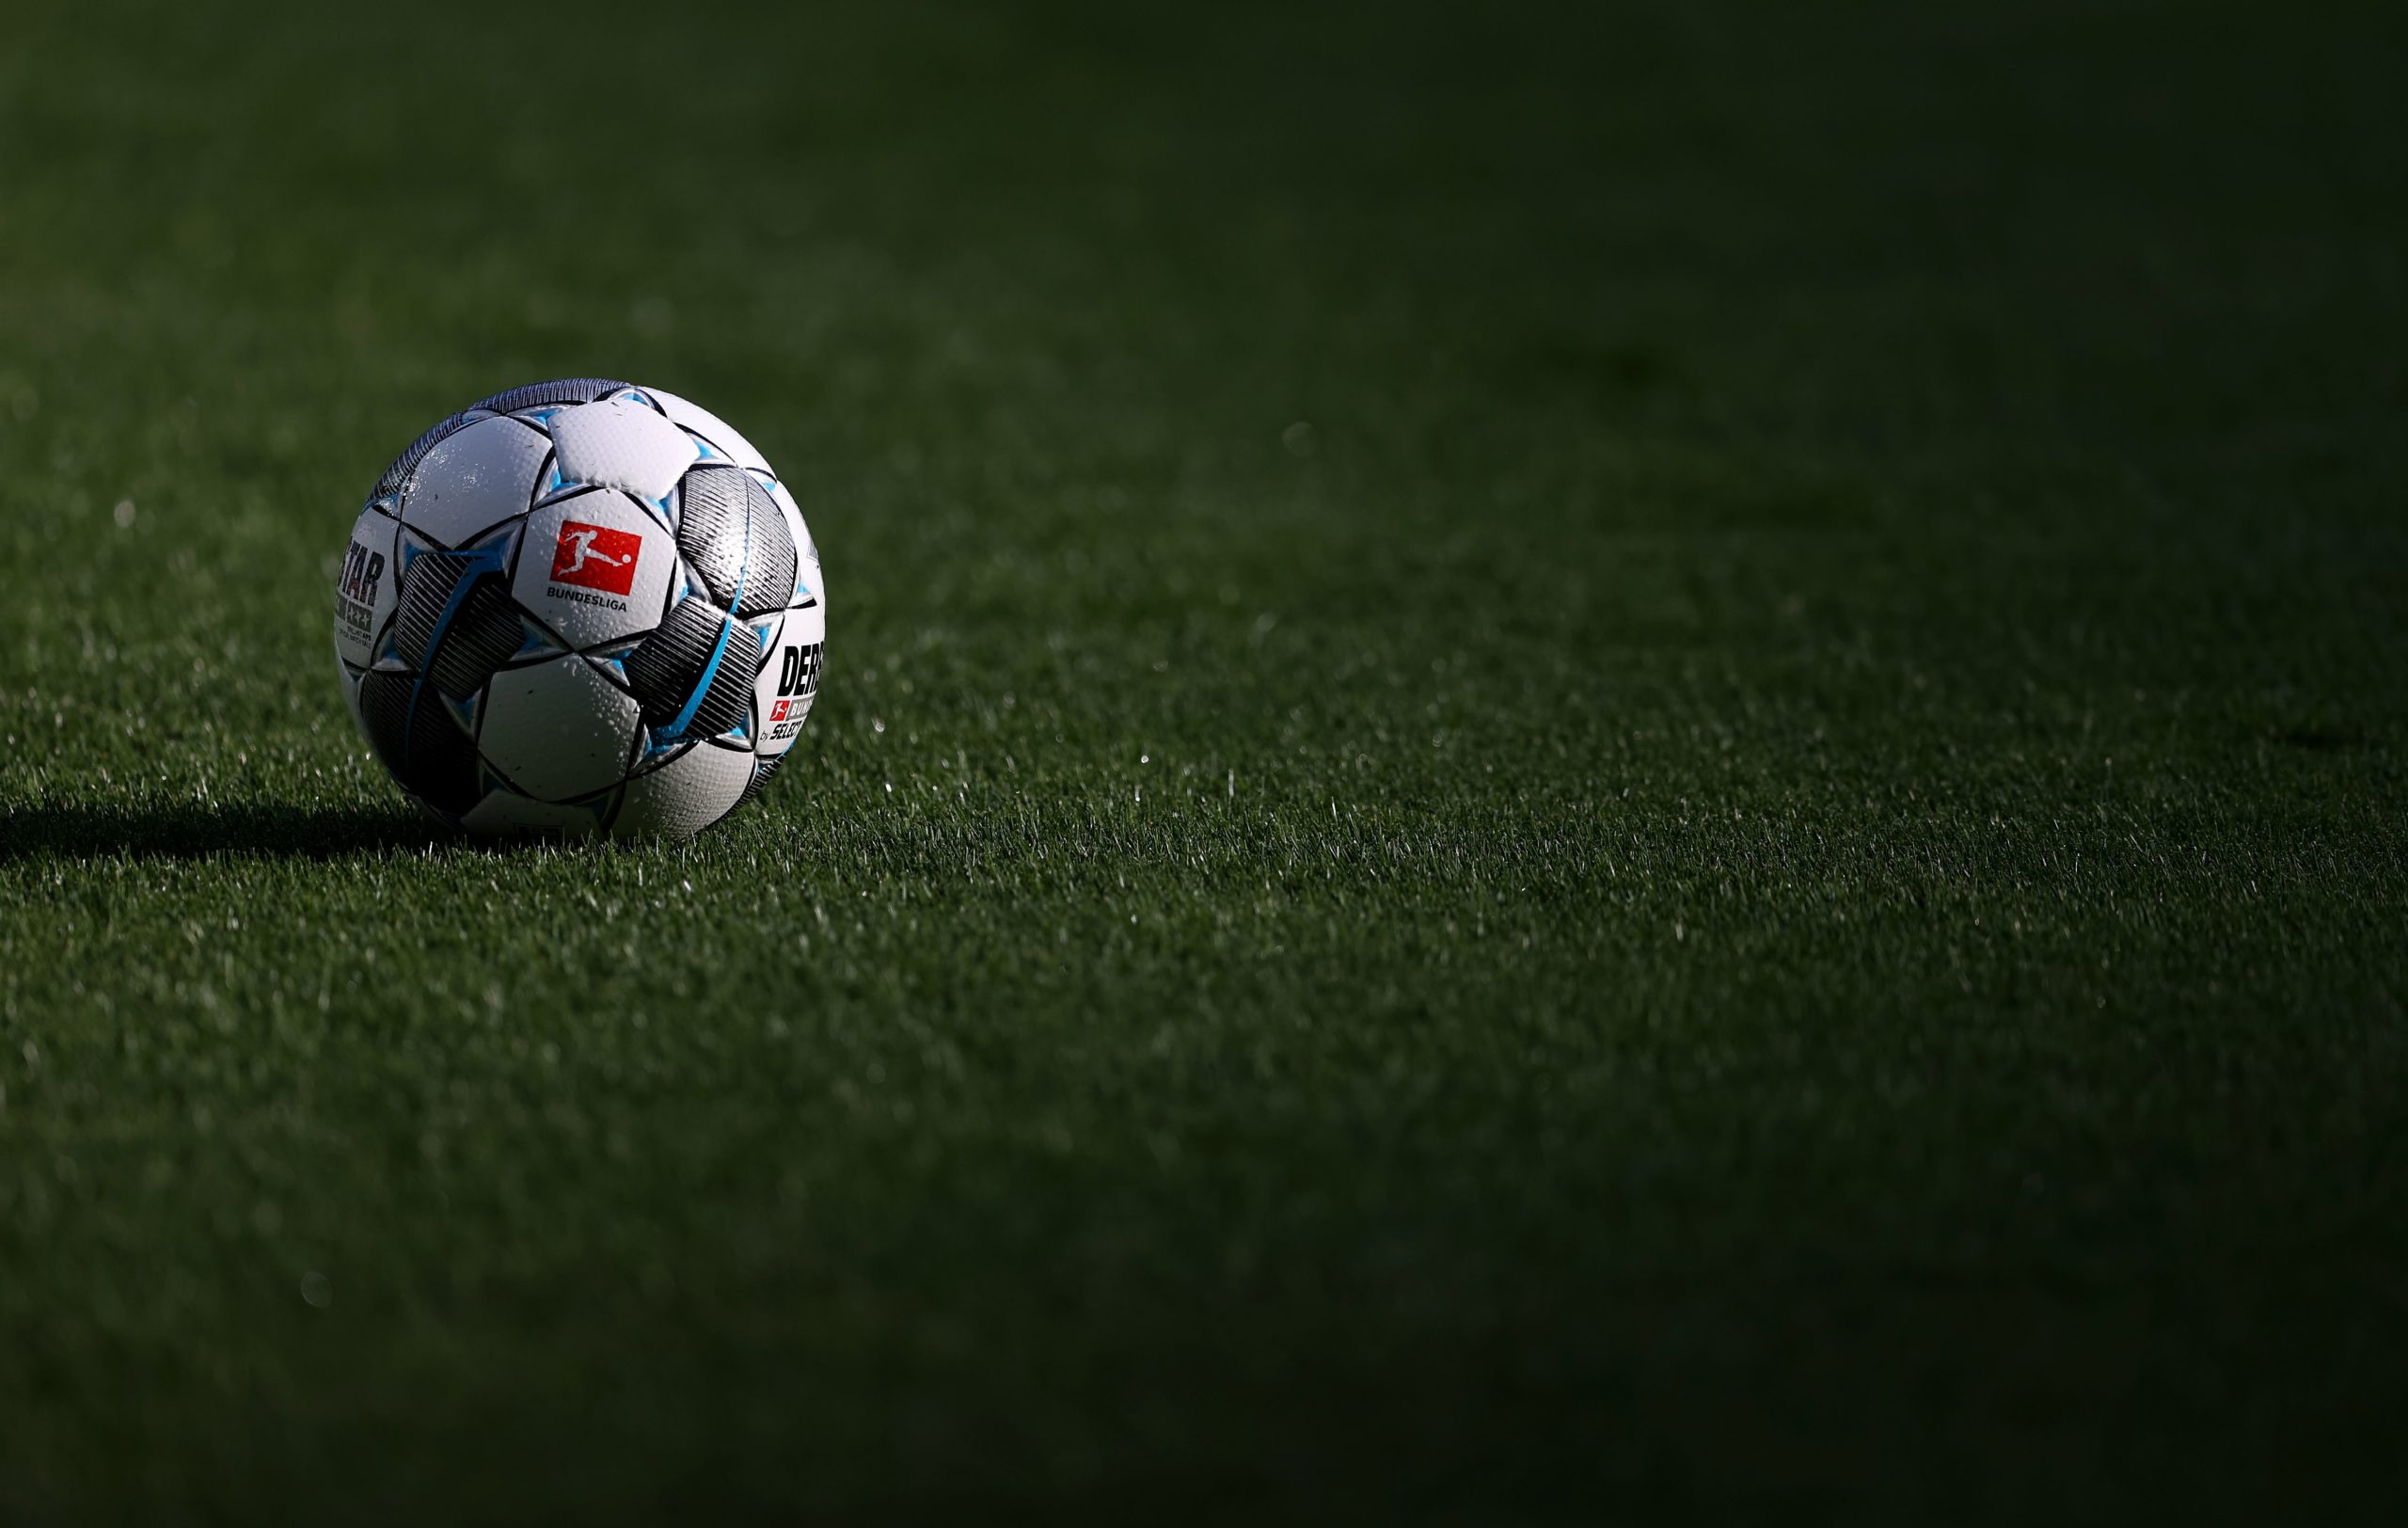 Die Corona-Falle der Würzburger Kickers